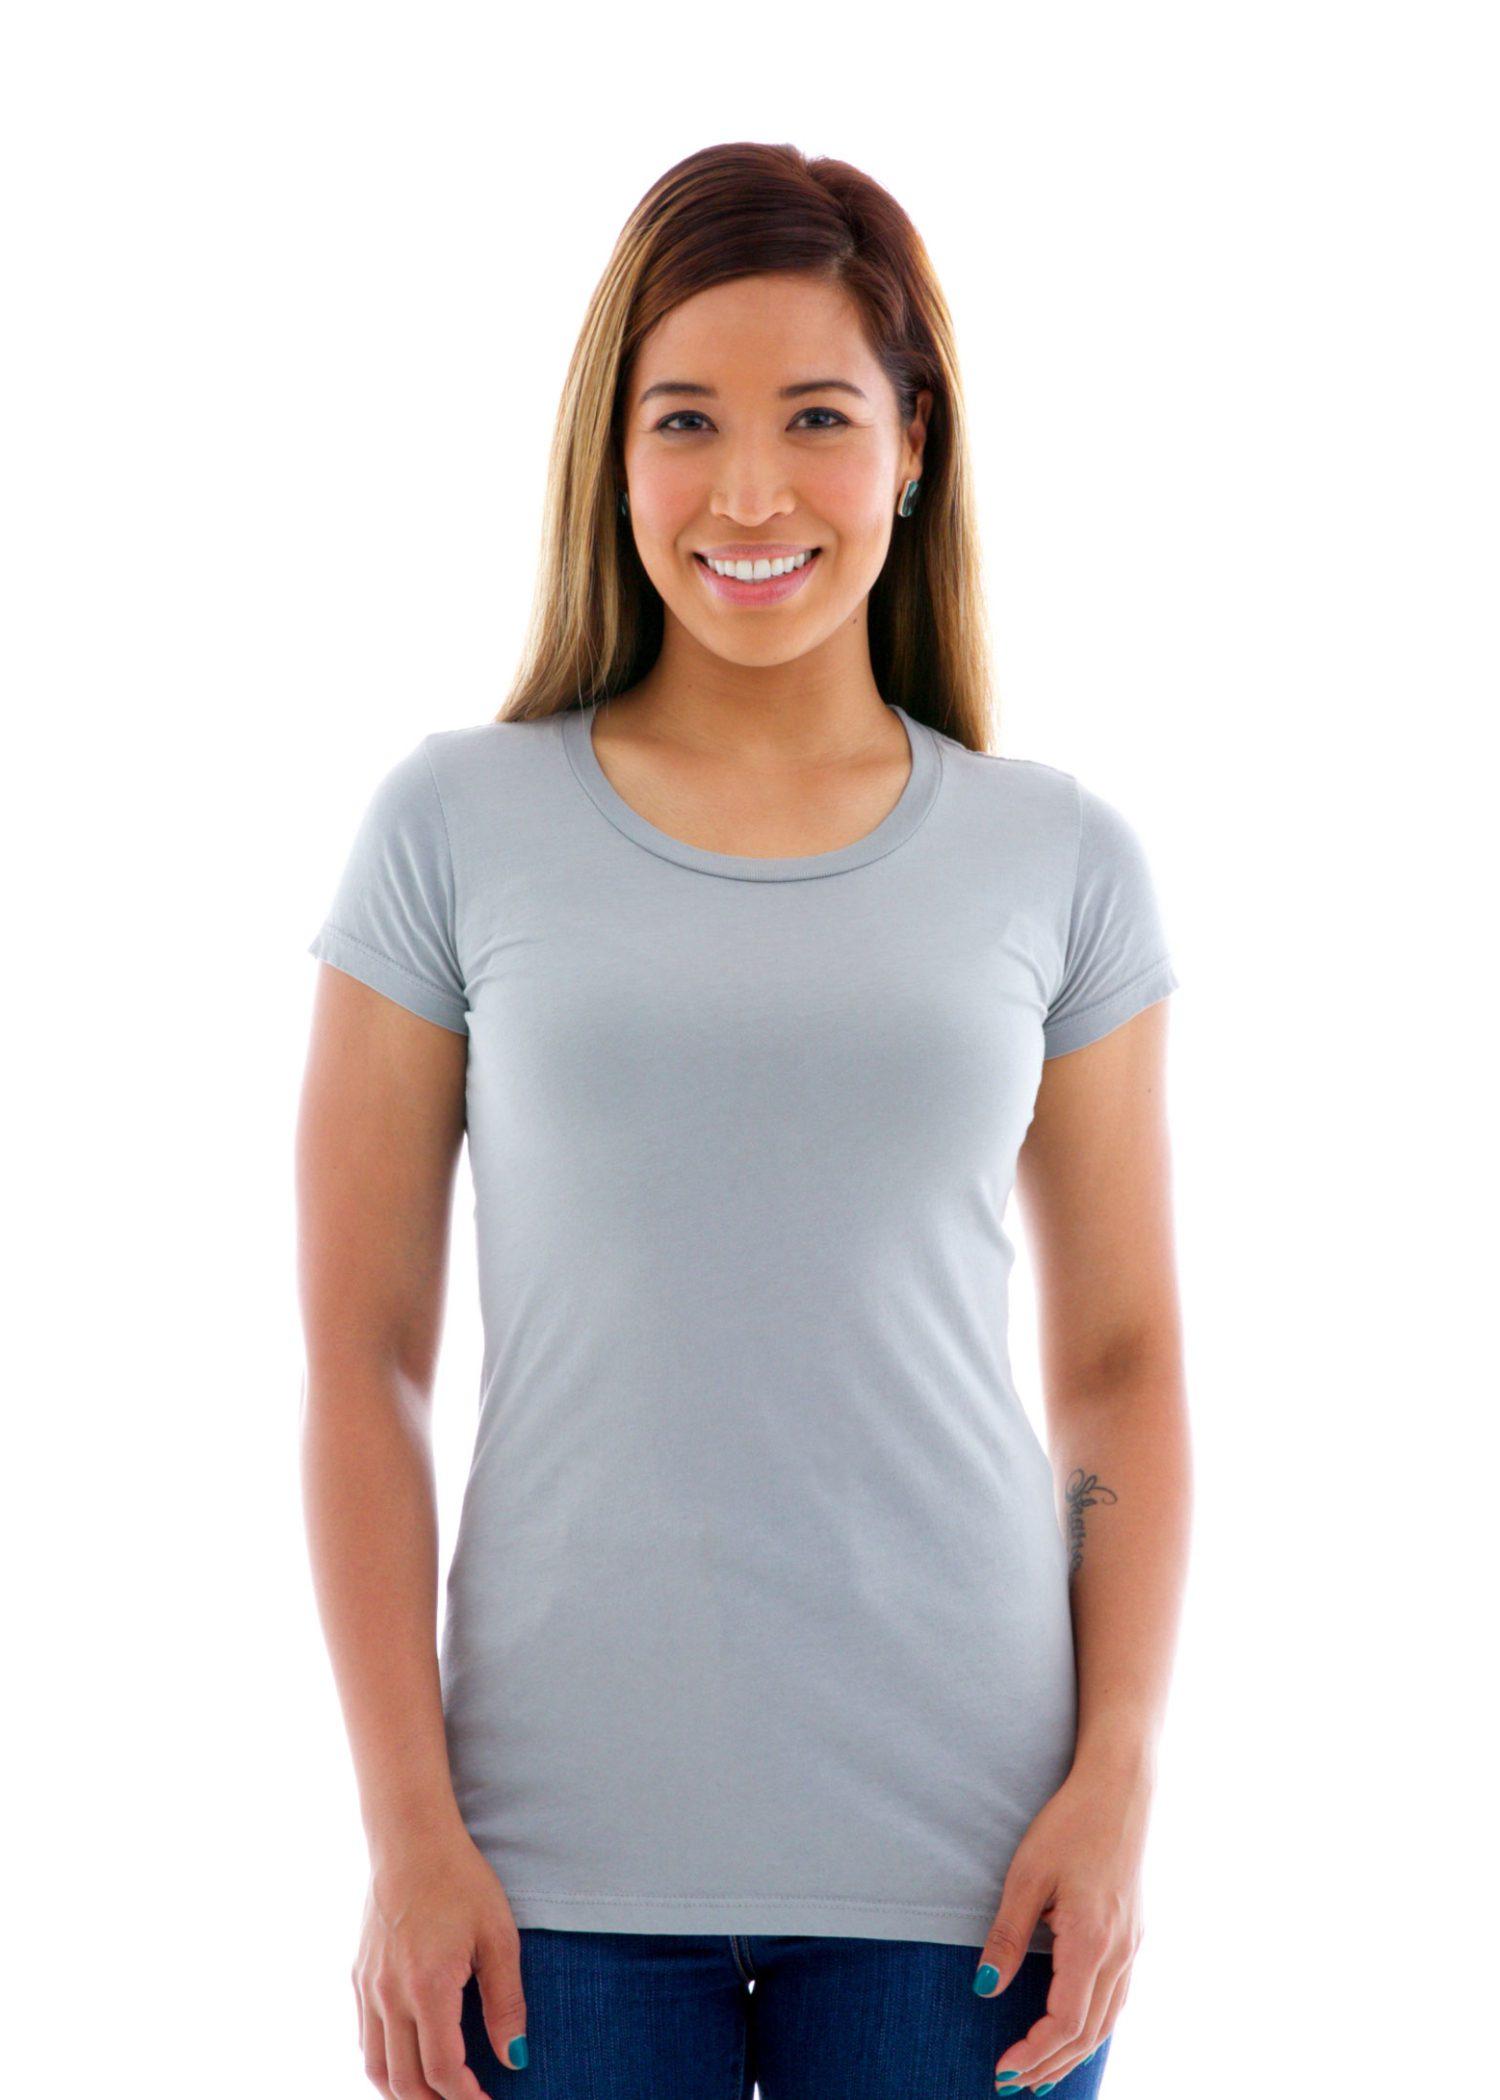 Fine Jersey Crew Short Sleeve T-Shirt Front View